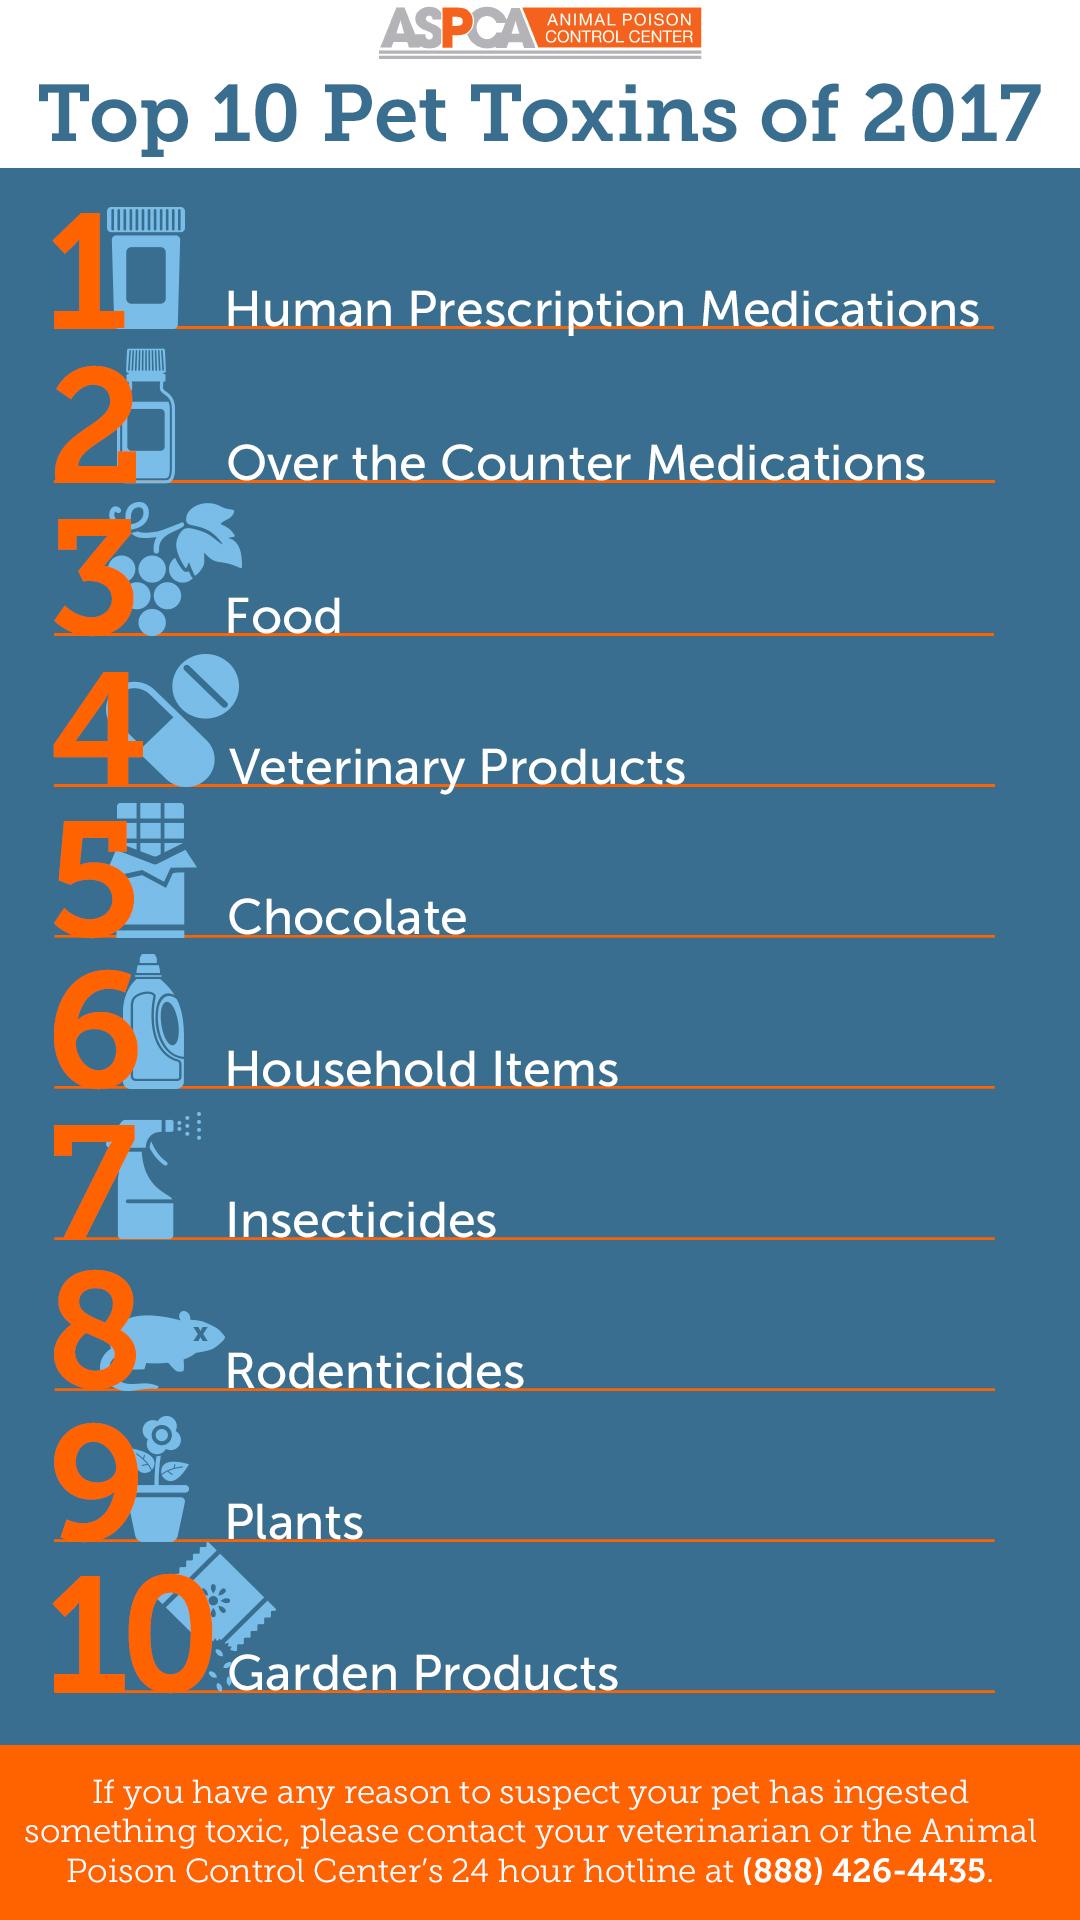 apcc-top-10-toxins-2017_030918_shareable-instagram-pinterest.jpg